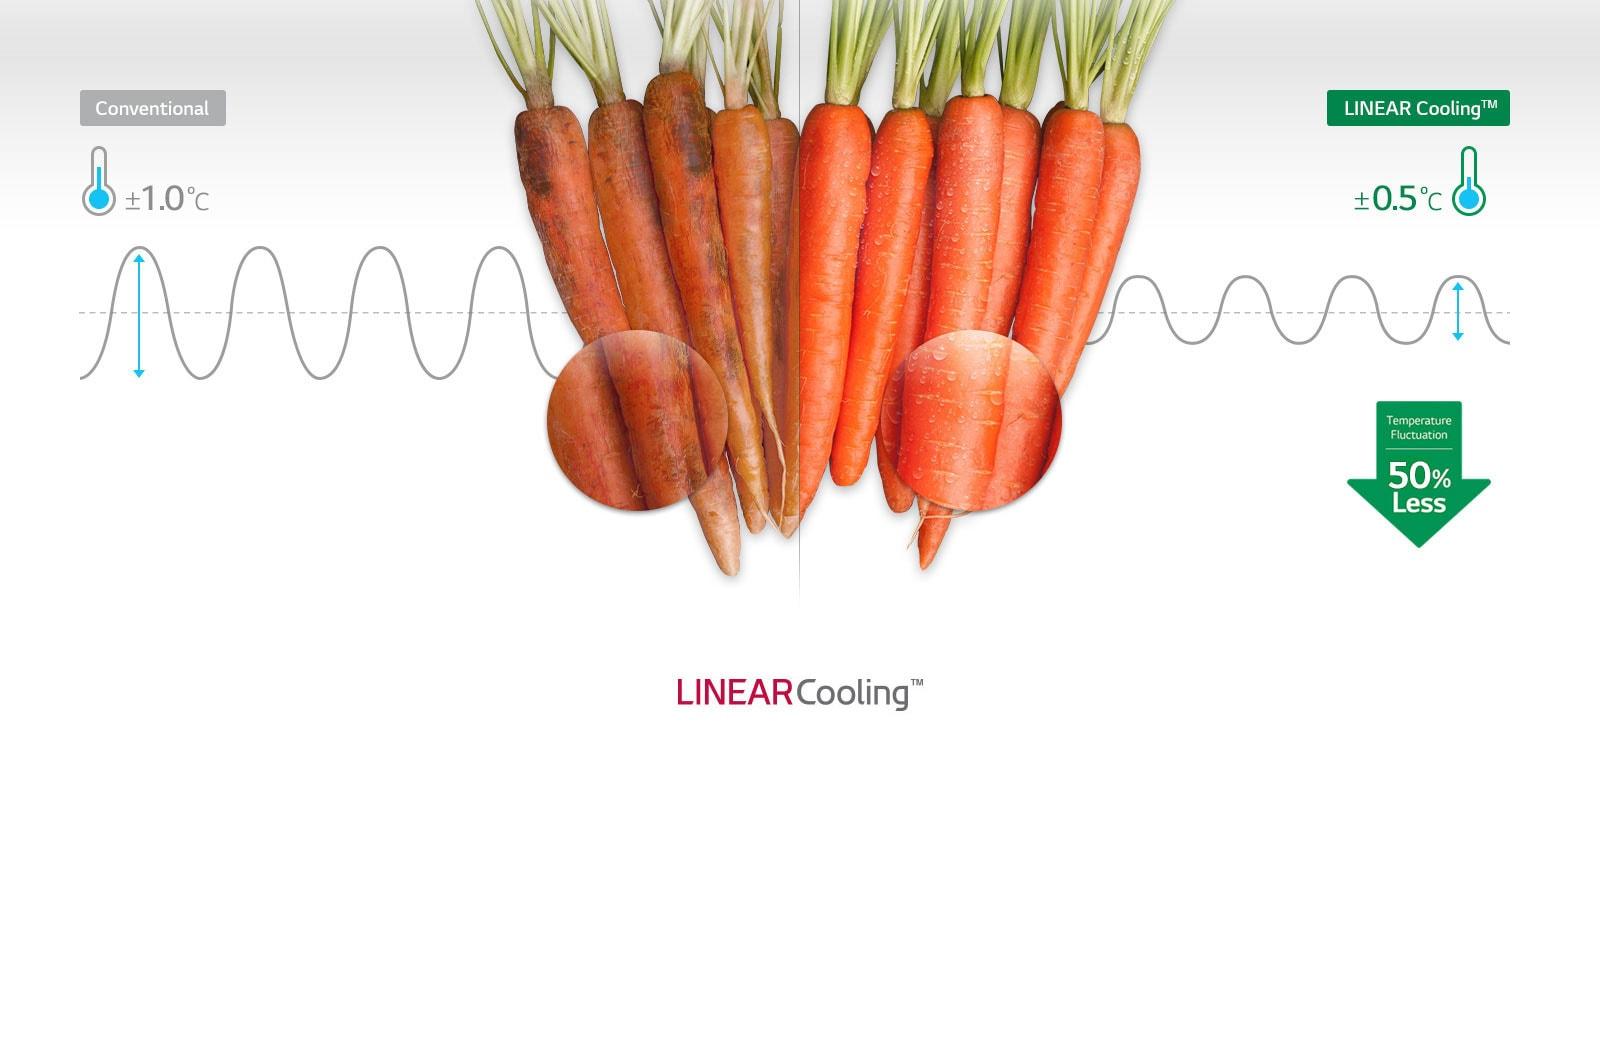 LT17HBHSLN_LINEAR-Cooling_05122018_D_v